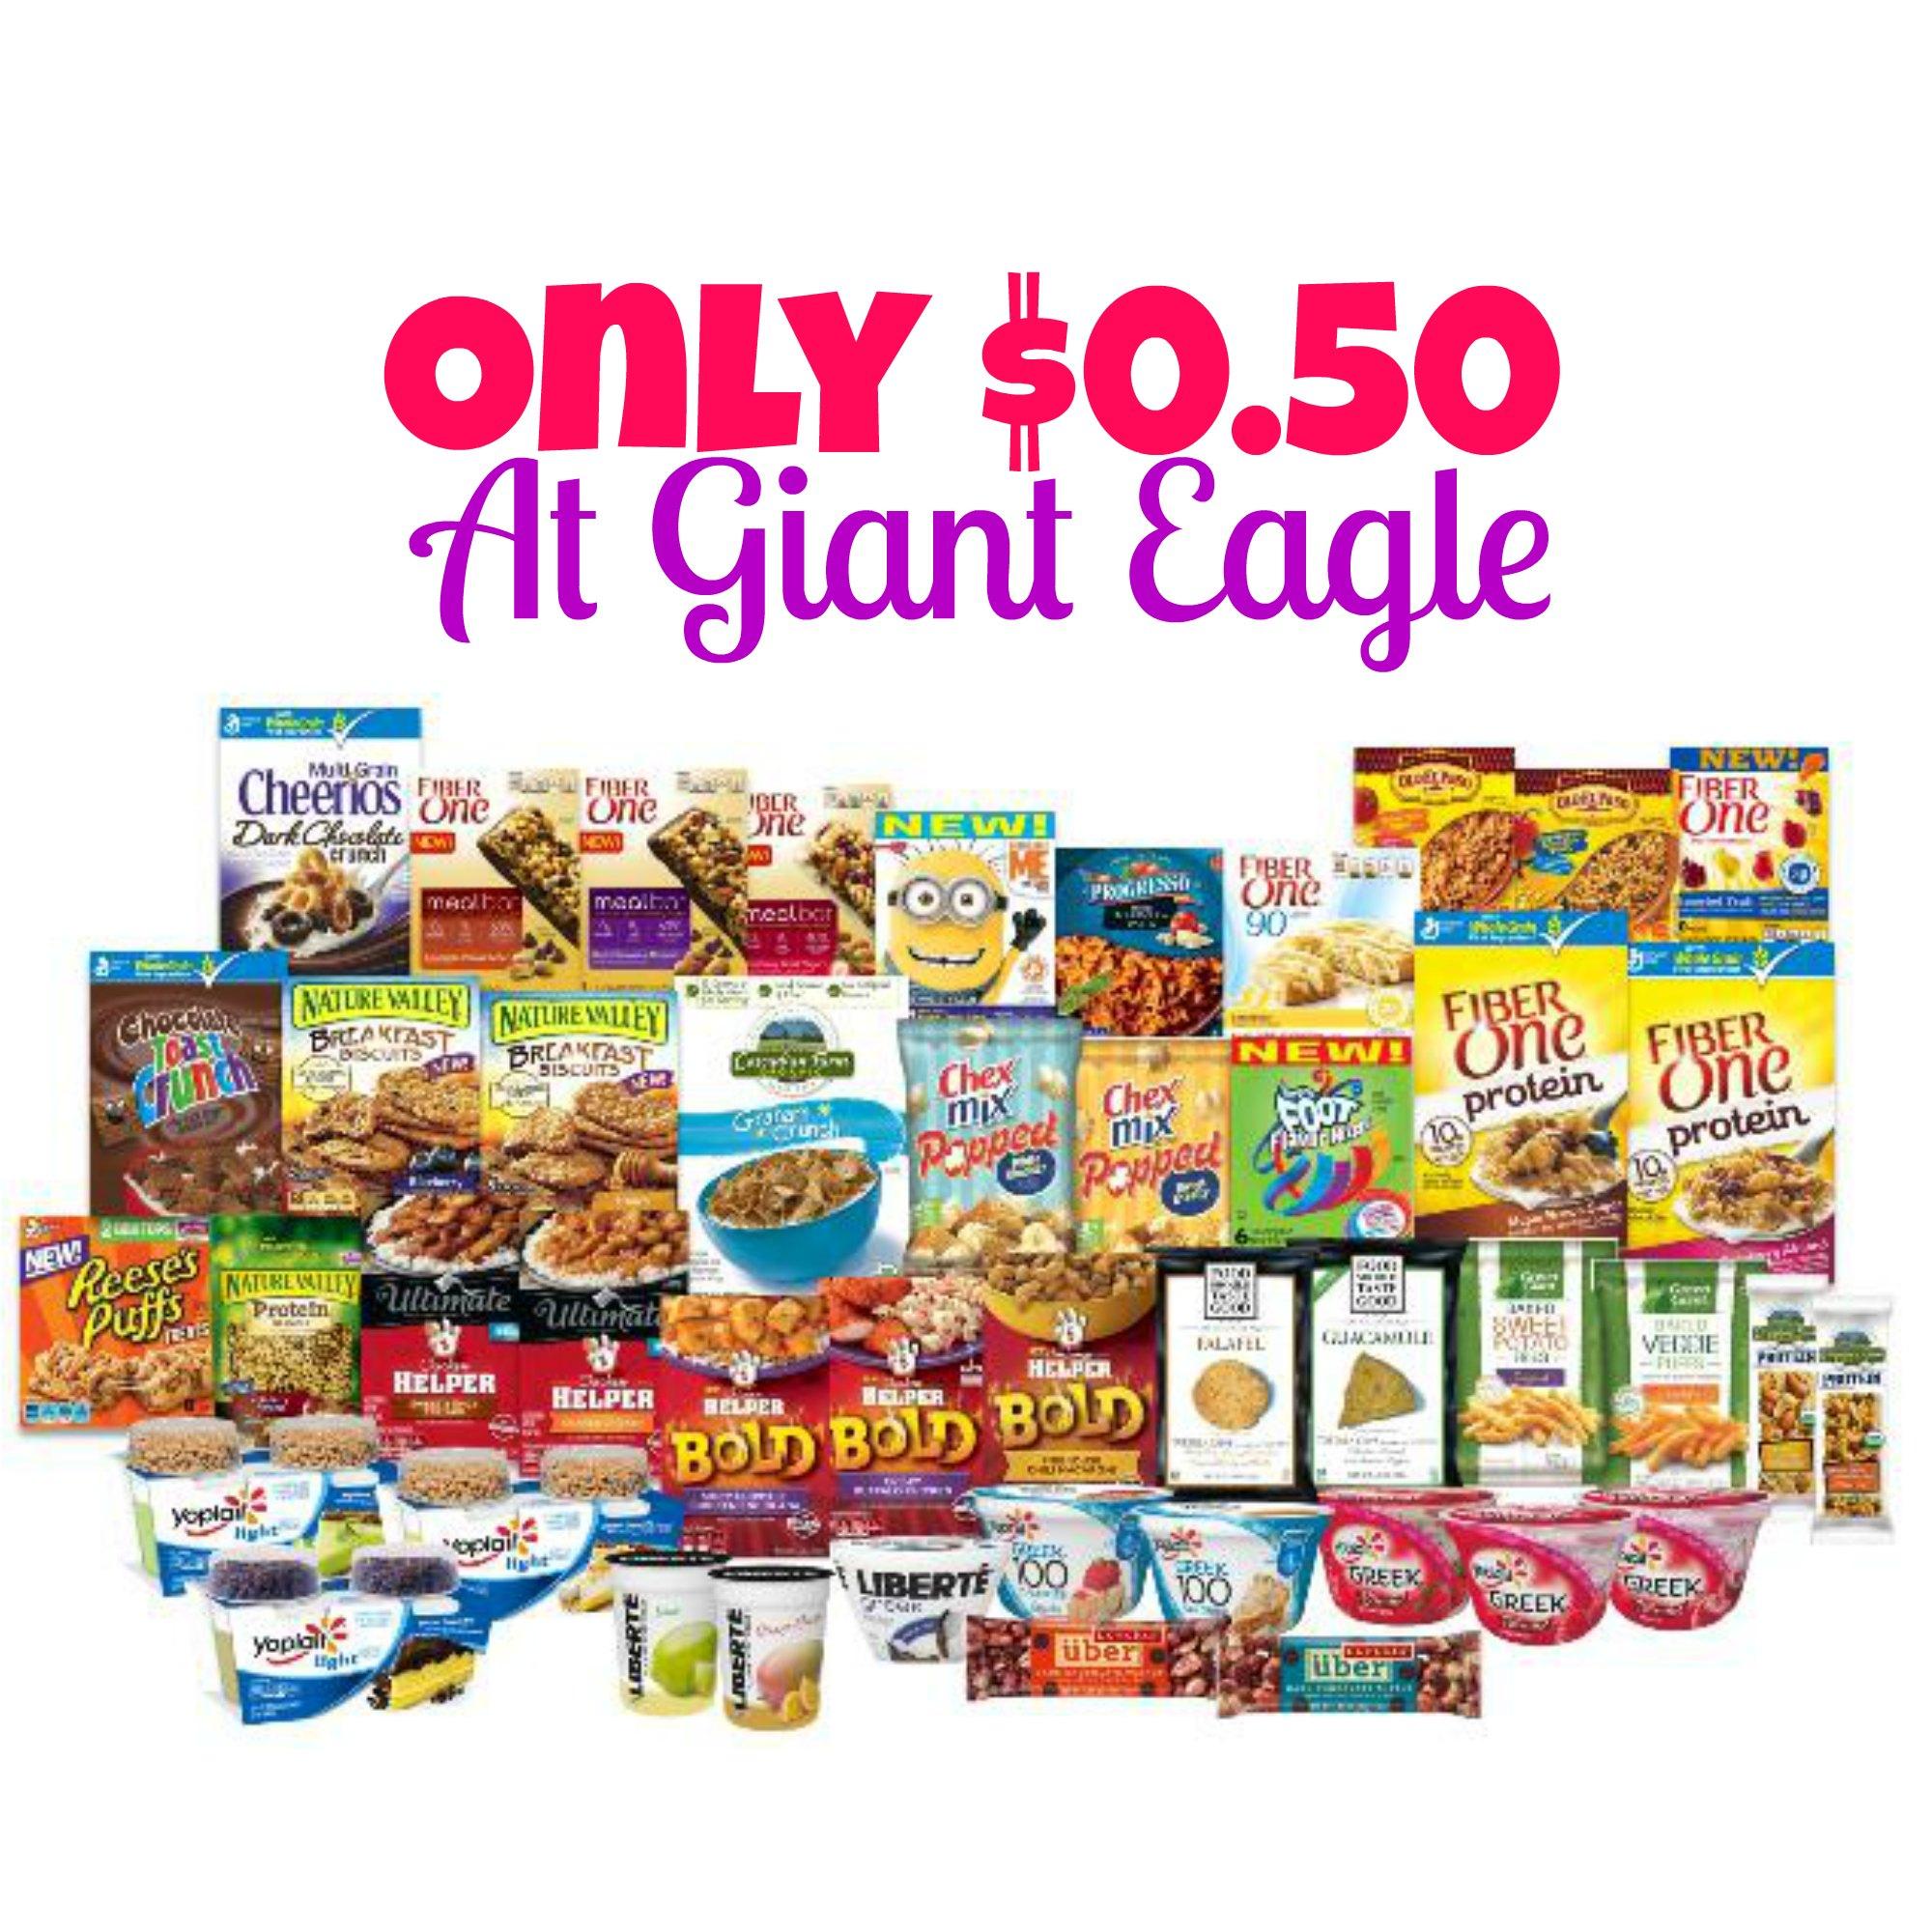 Giant Eagle   Mojosavings   Page 2 - Free Printable Giant Eagle Coupons